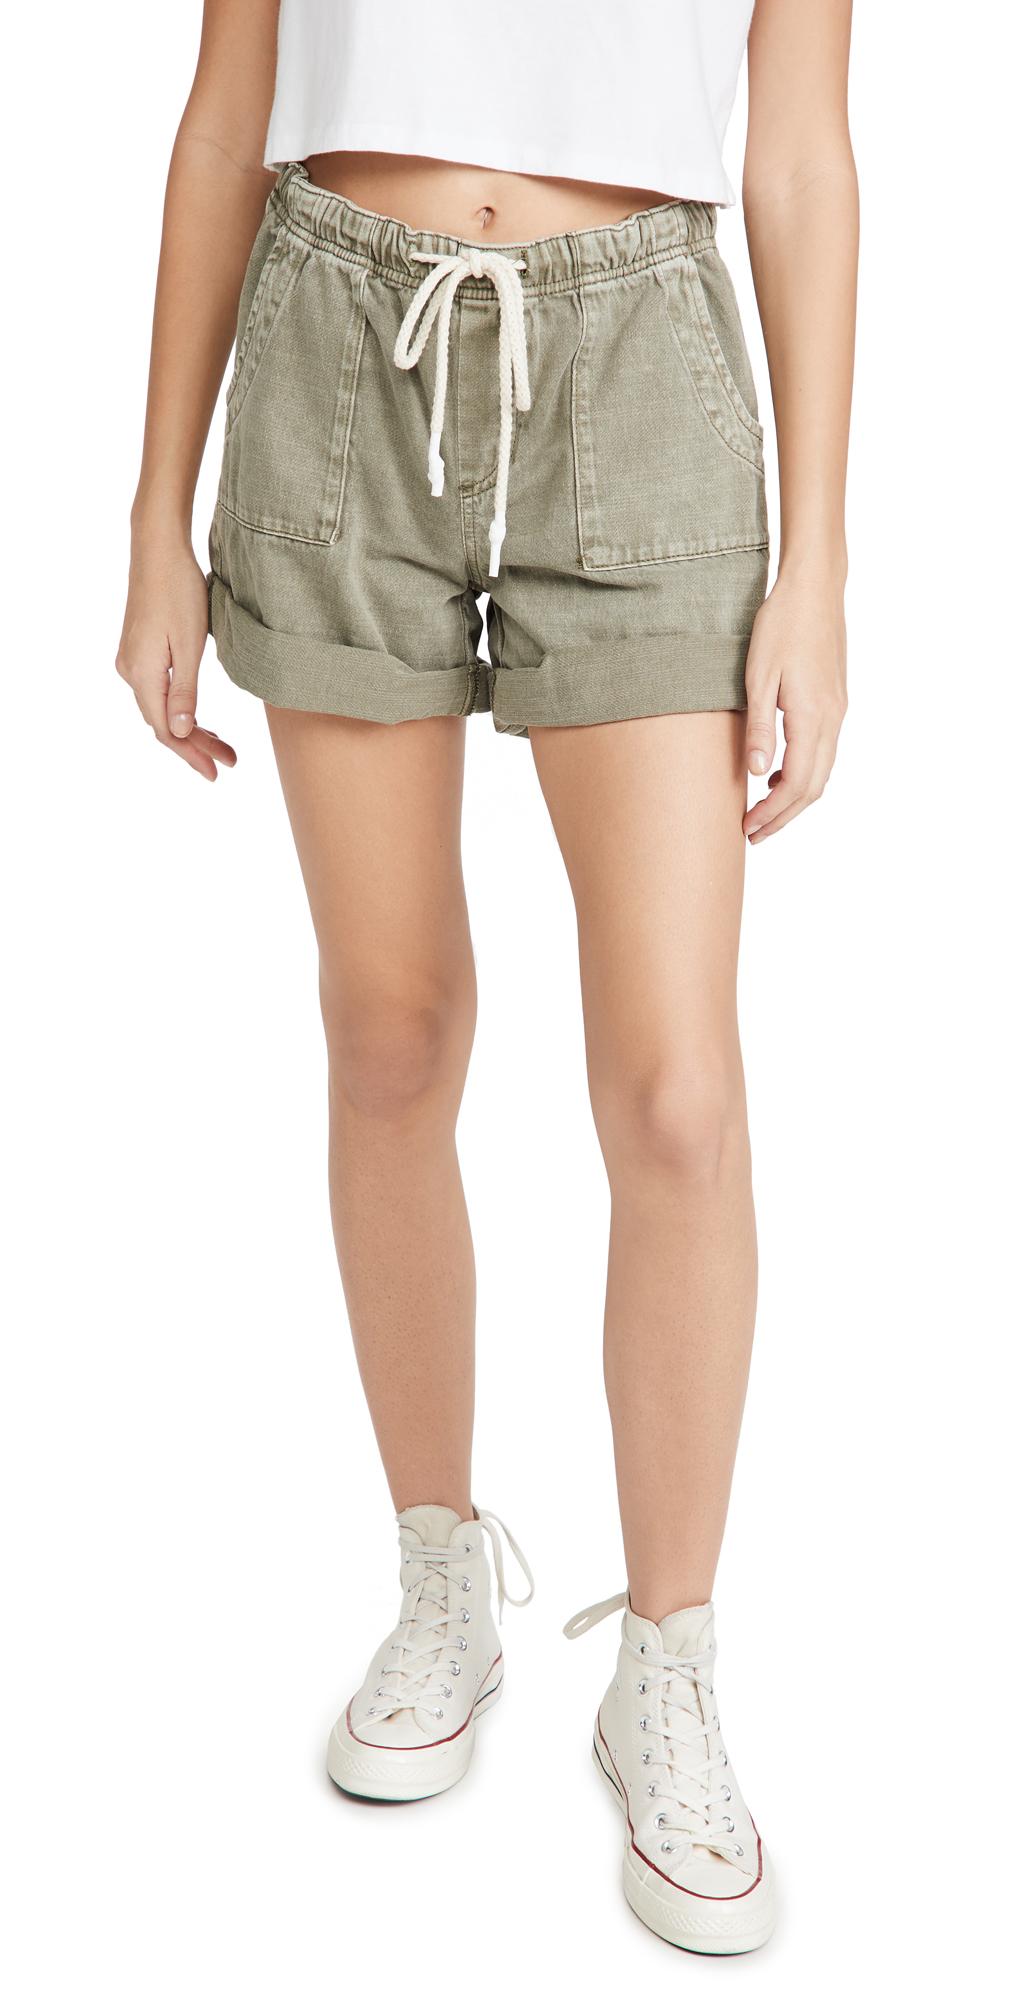 One Teaspoon Vintage Khaki Shabby Bandit Denim Shorts